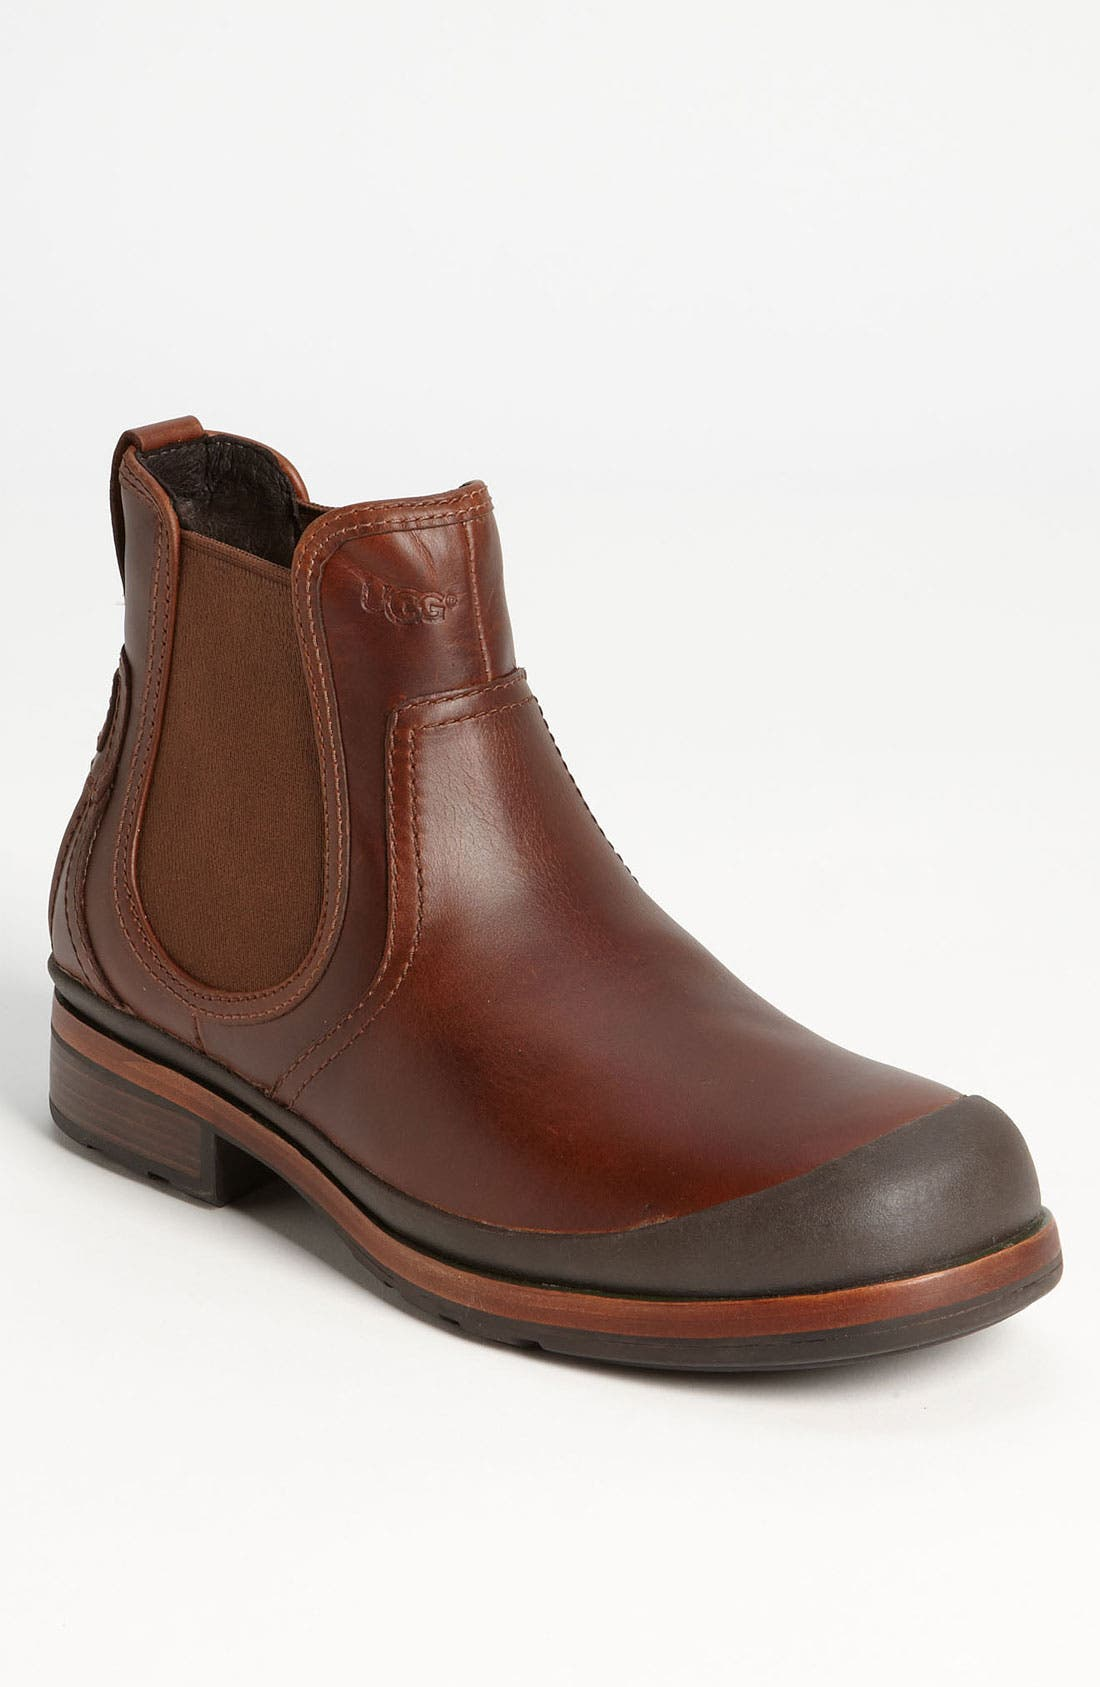 Main Image - UGG® Australia 'Matteson' Chelsea Boot (Men)